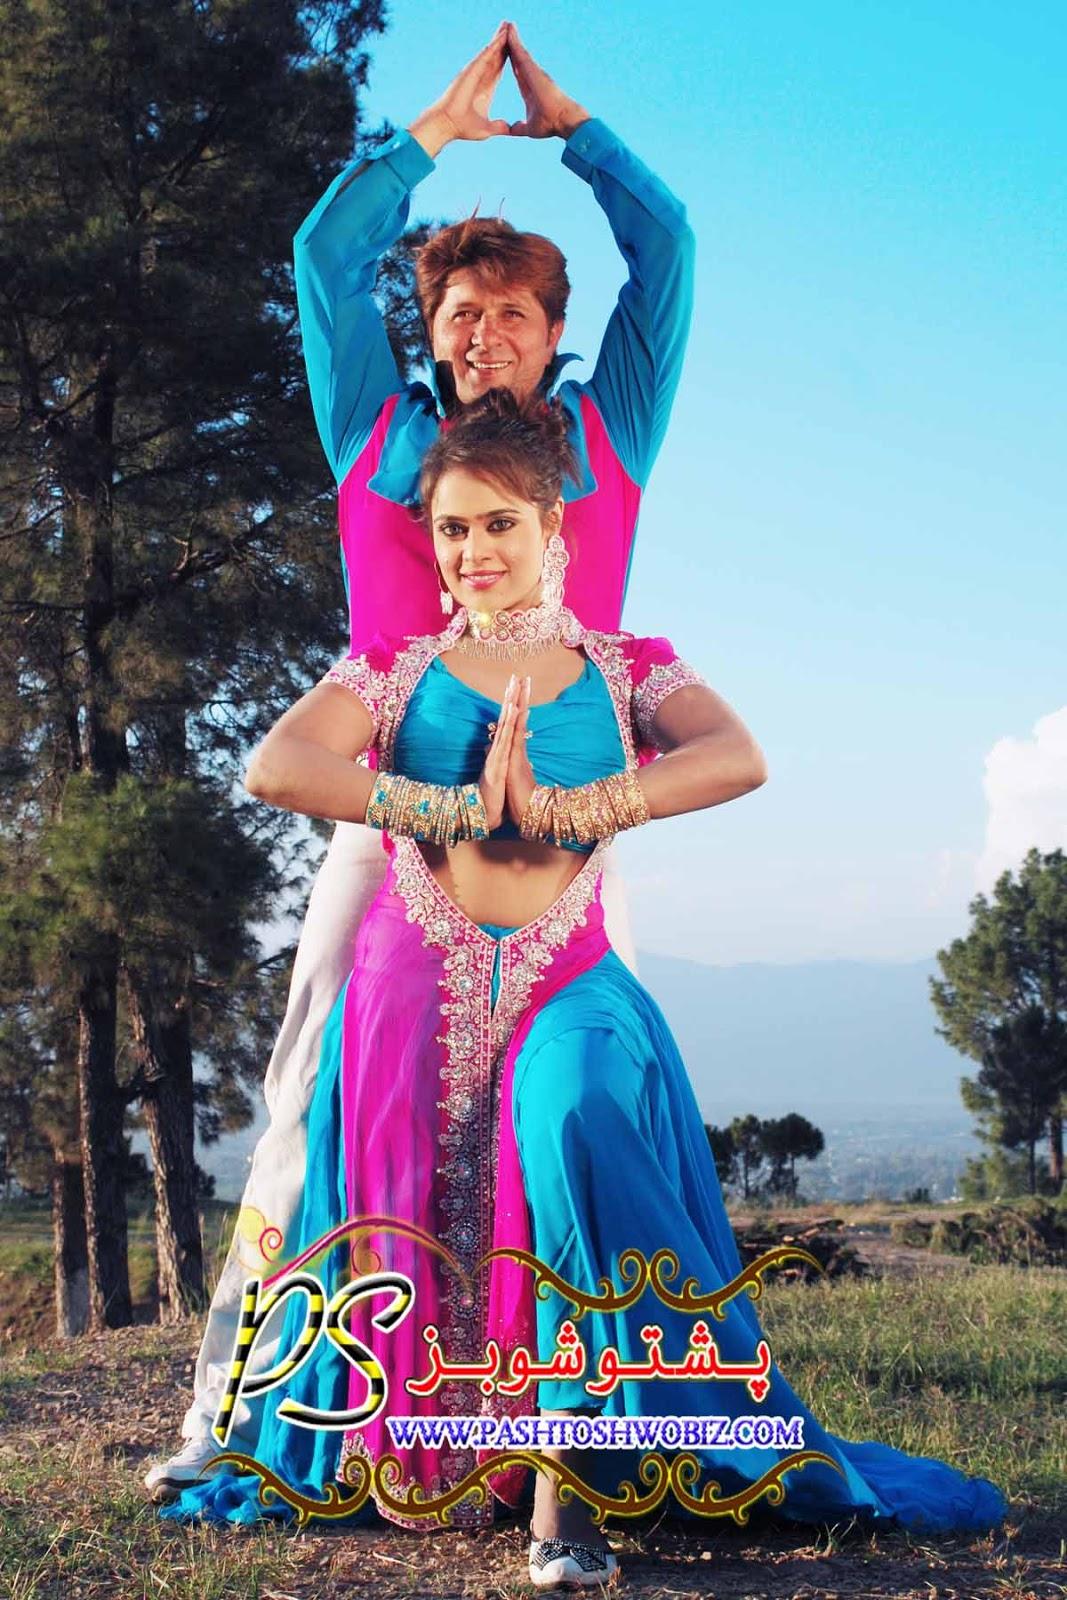 Arbaz Khan and Sobia Khan